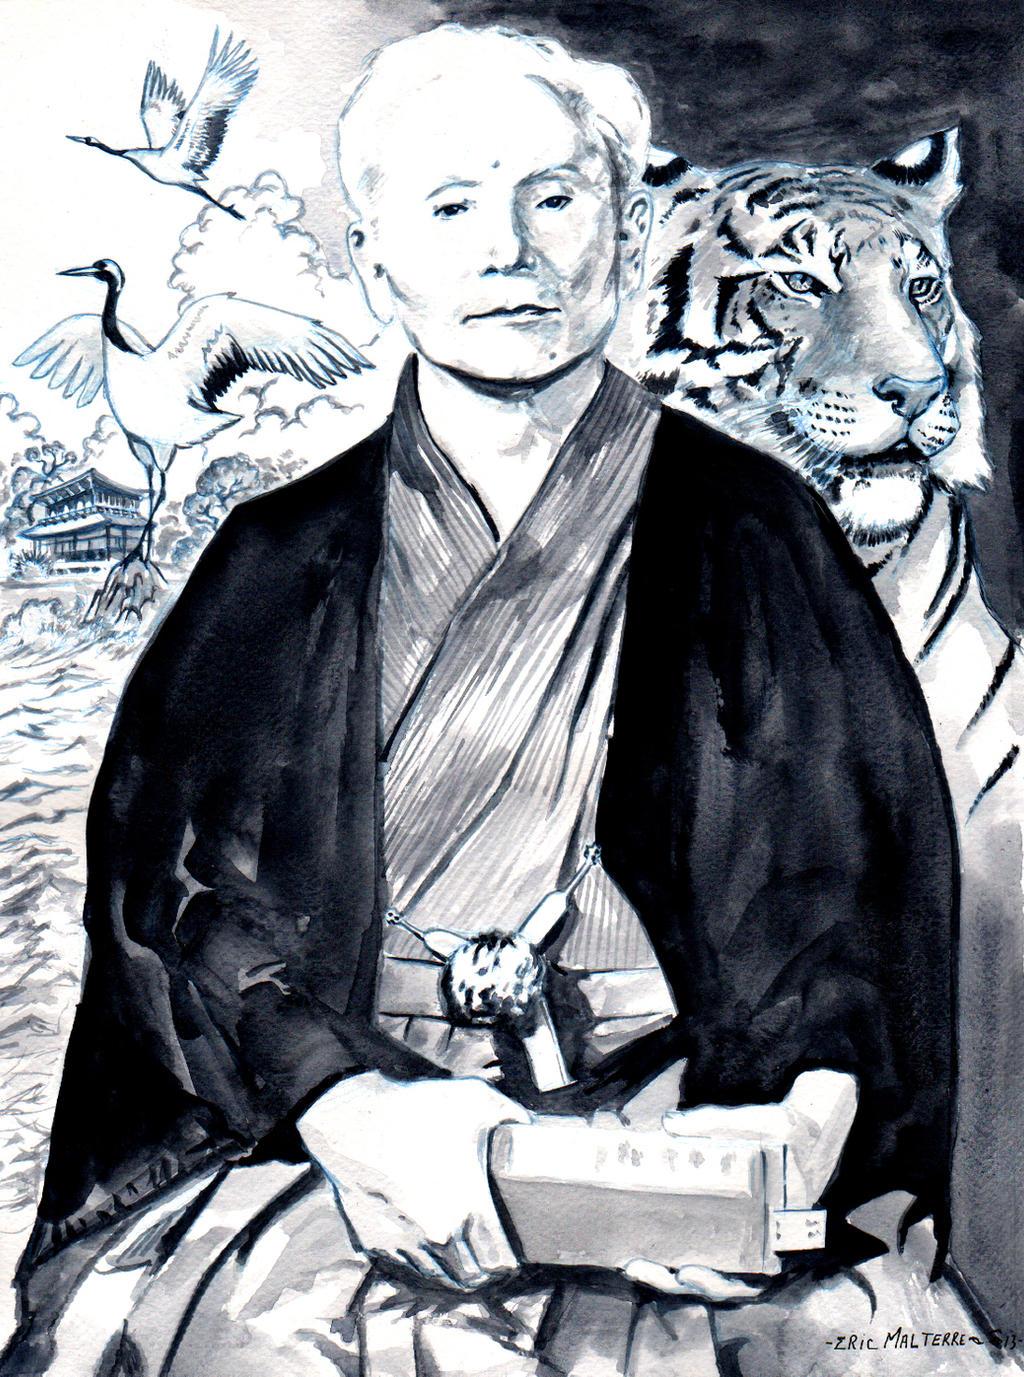 Gichin Funakoshi by emalterre